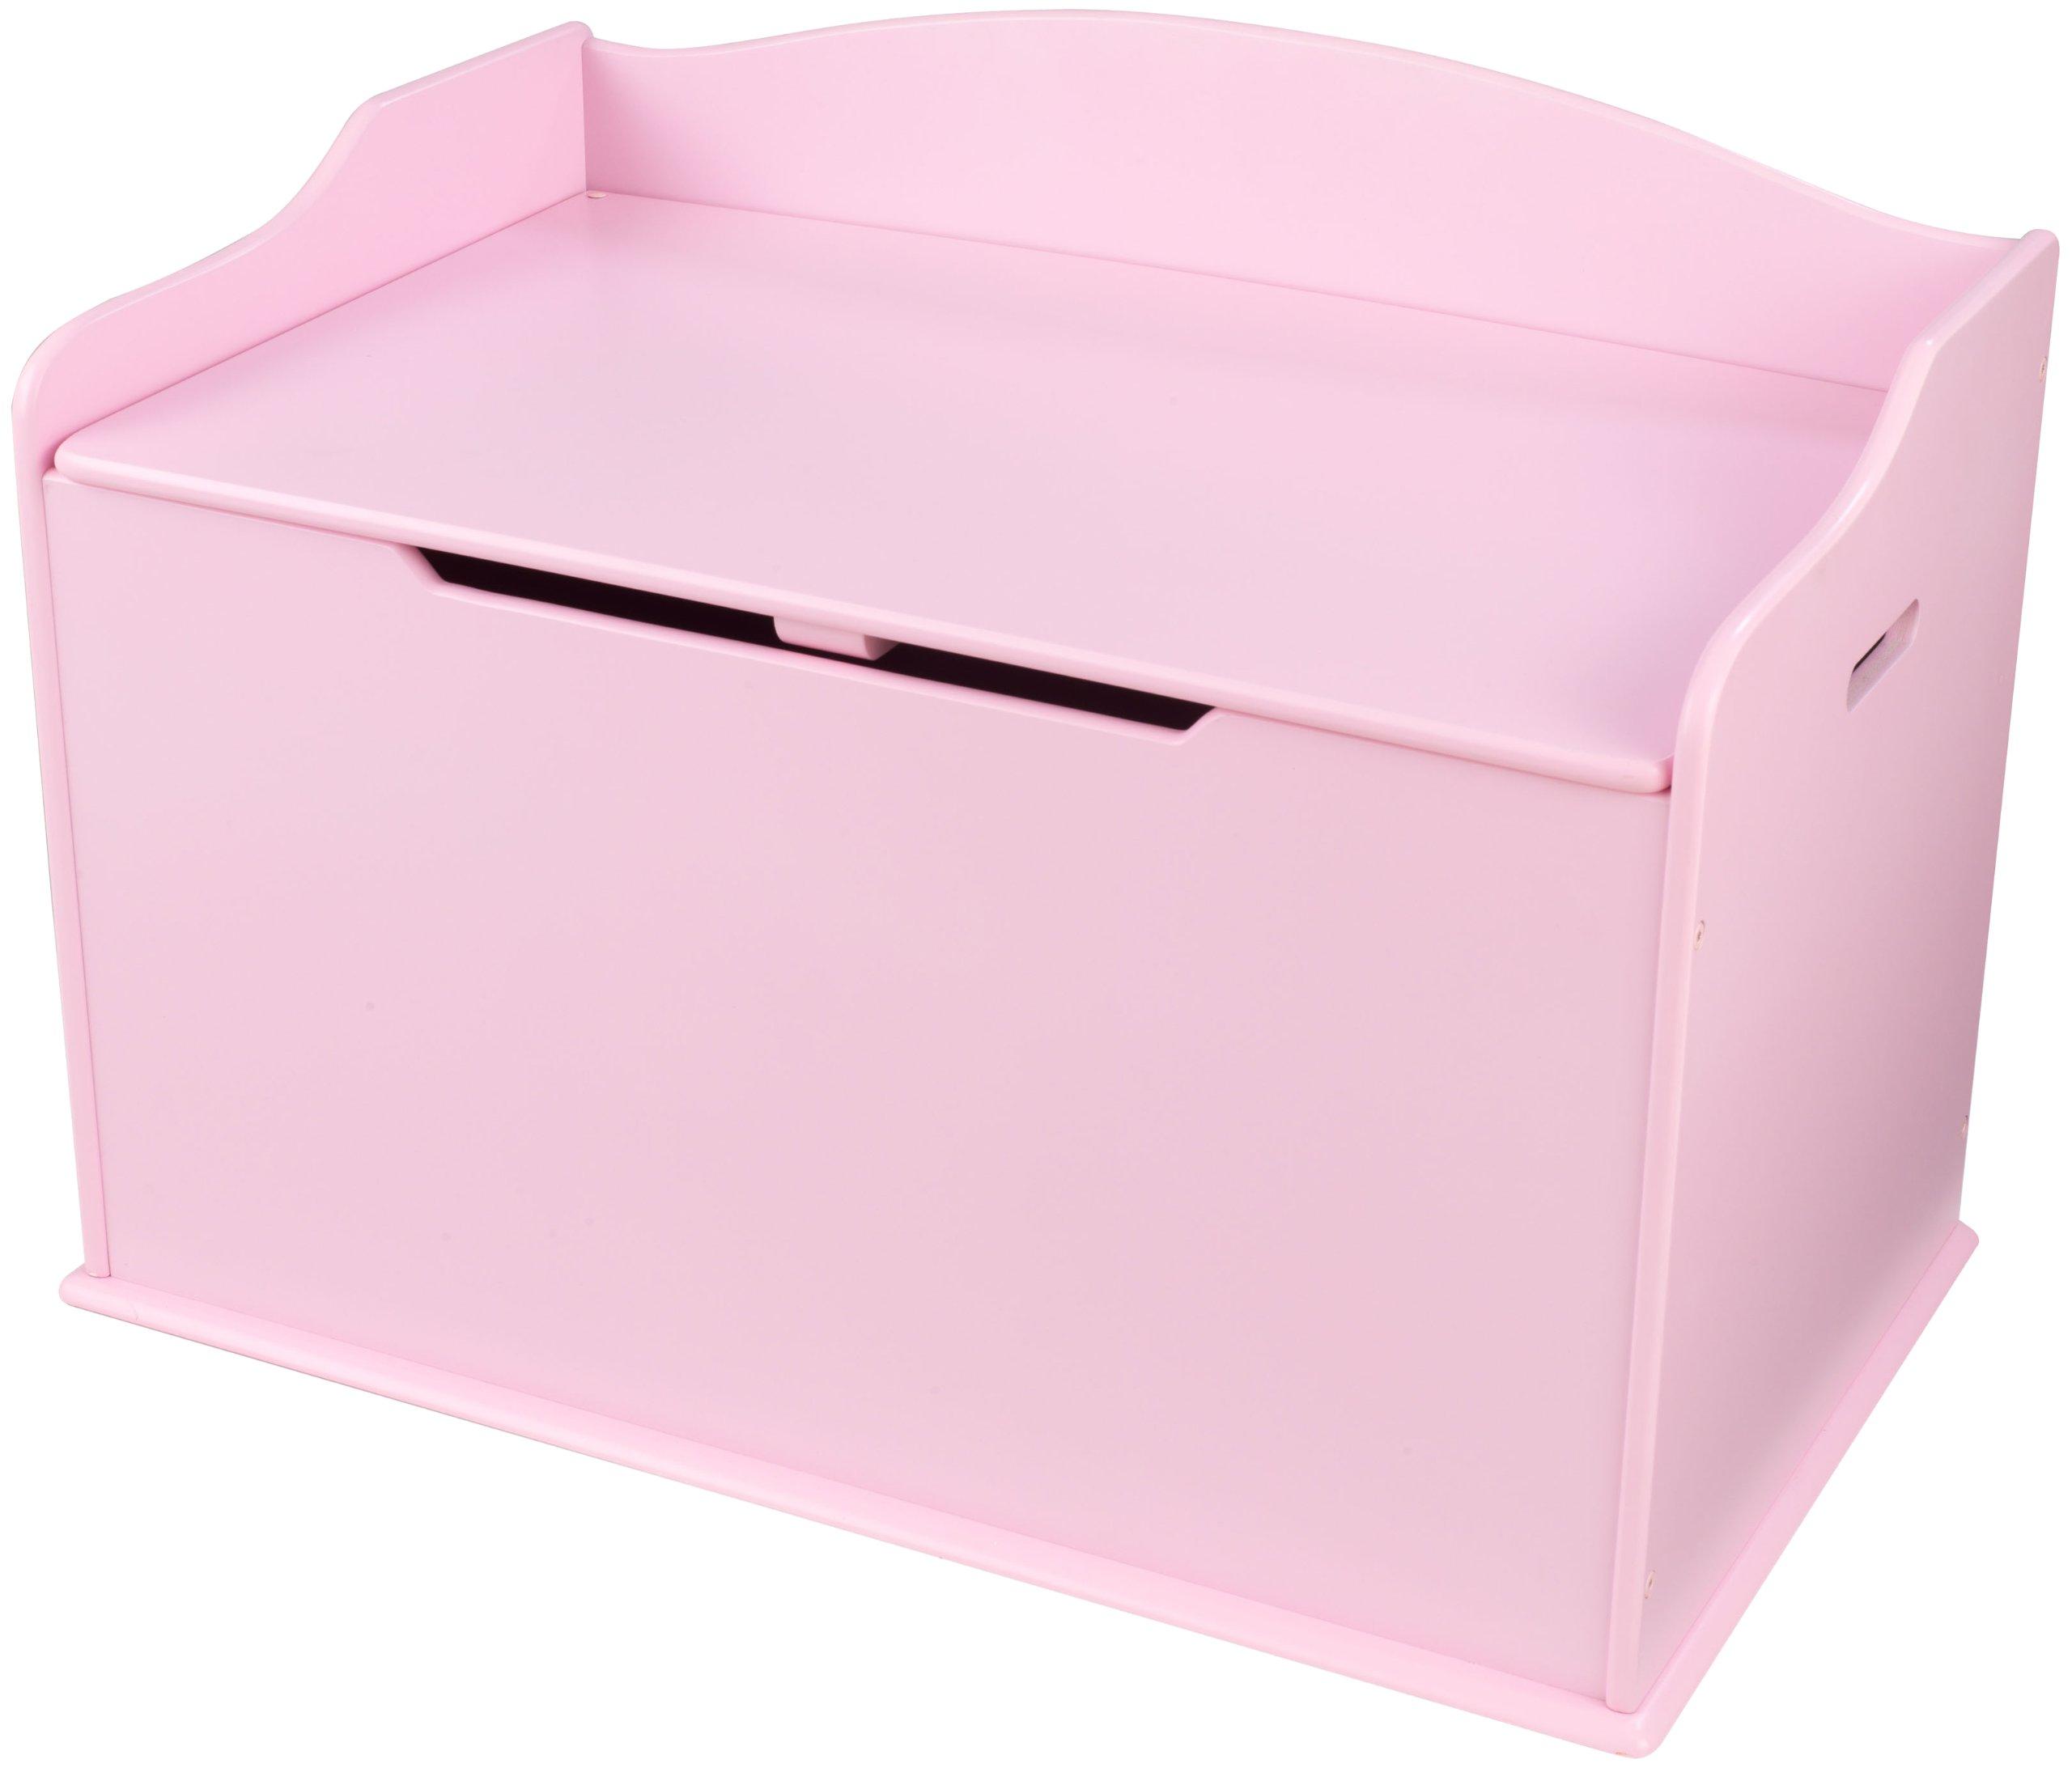 Kidkraft Austin Toy Box - pink by KidKraft